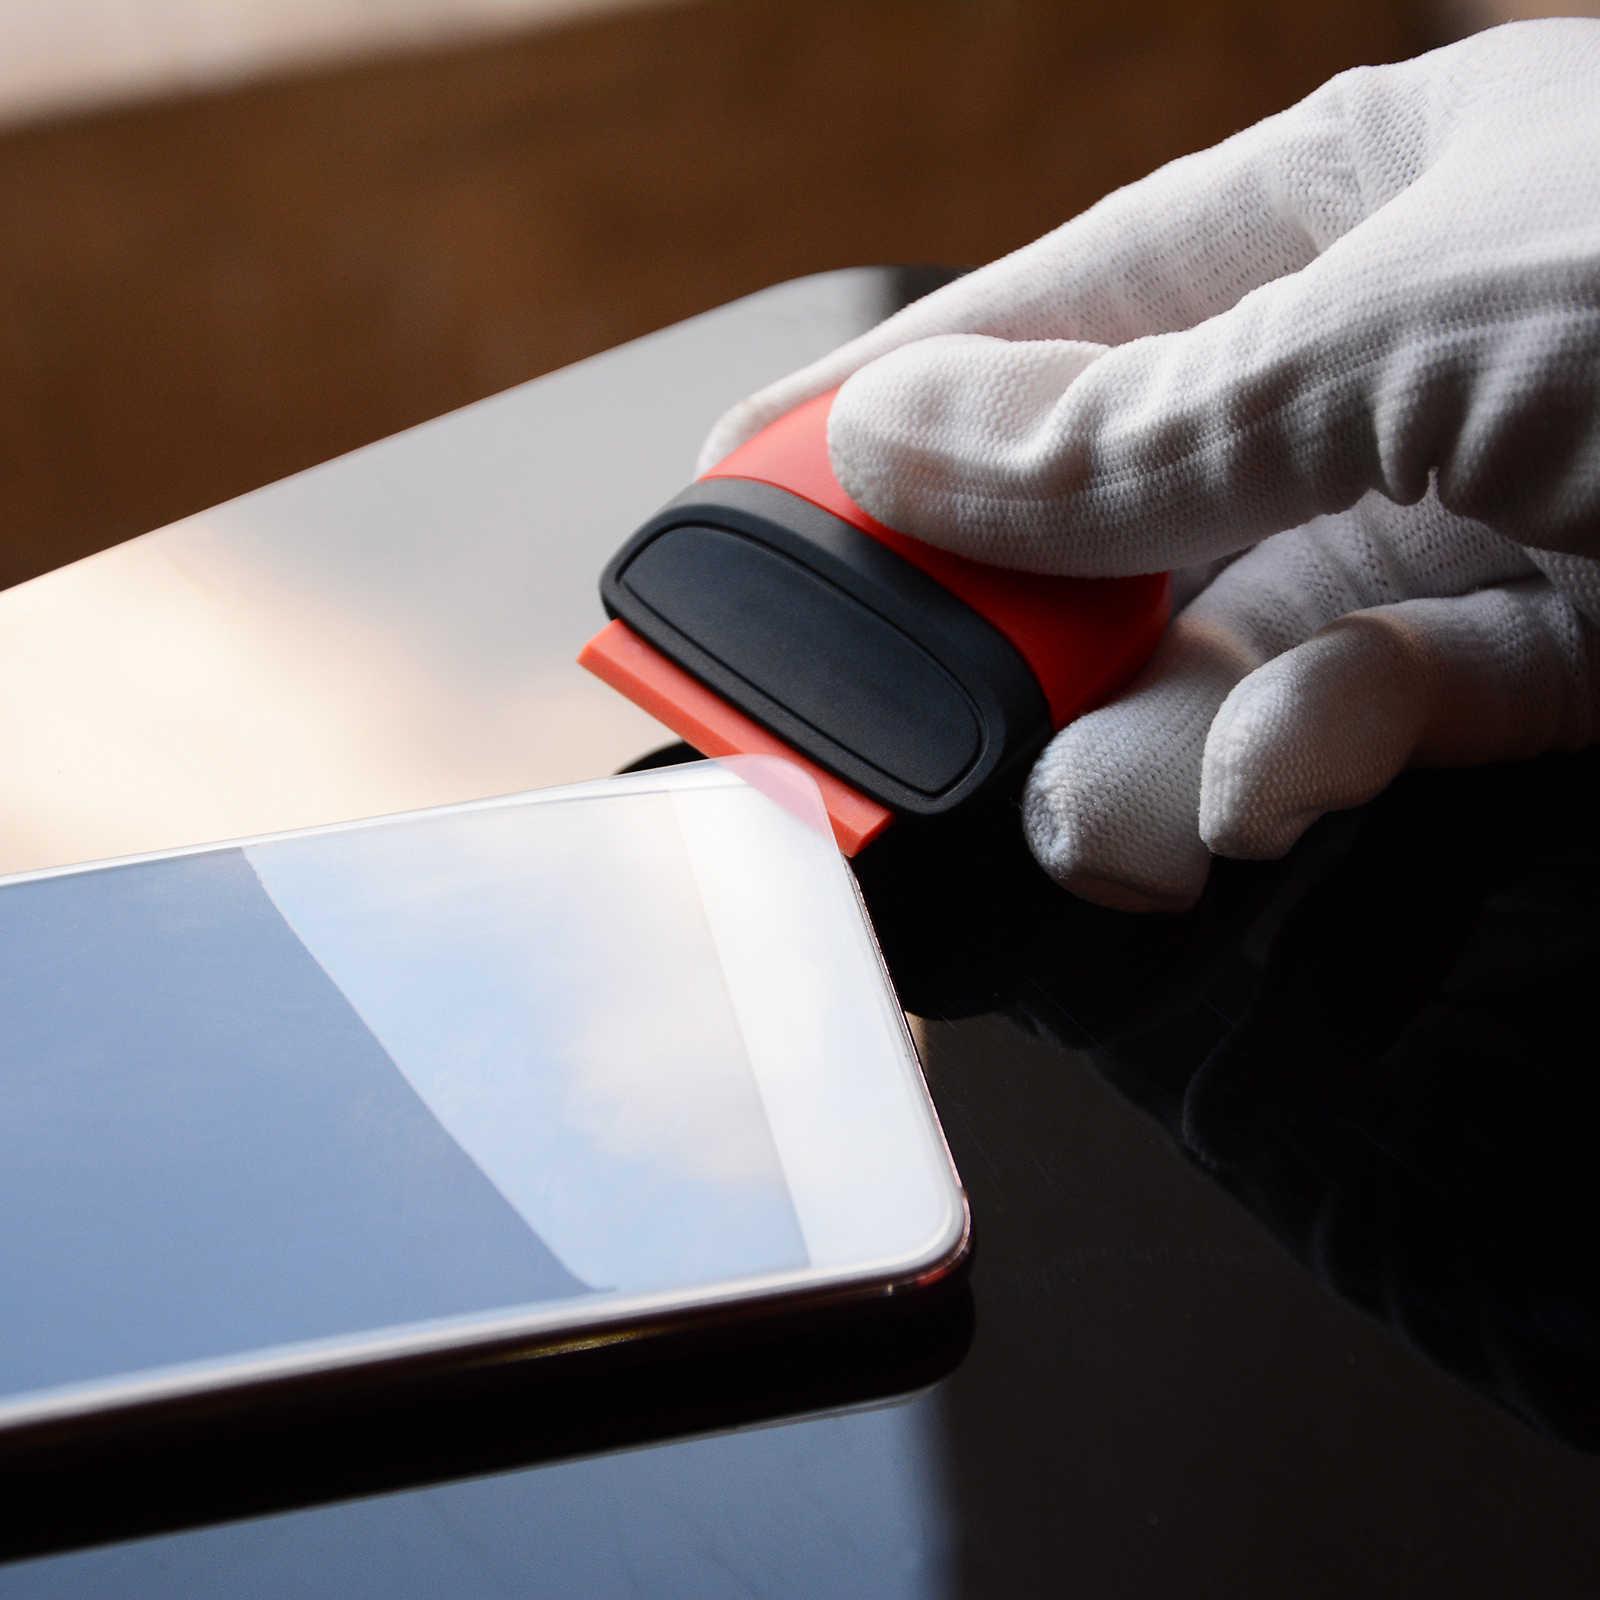 Ehdis Vinyl Wrap Film Kaca Mobil Razor Pengikis + 100 Pcs Plastik Pisau Stiker Karbon Pembungkus Foil Squeegee Auto Aksesoris alat